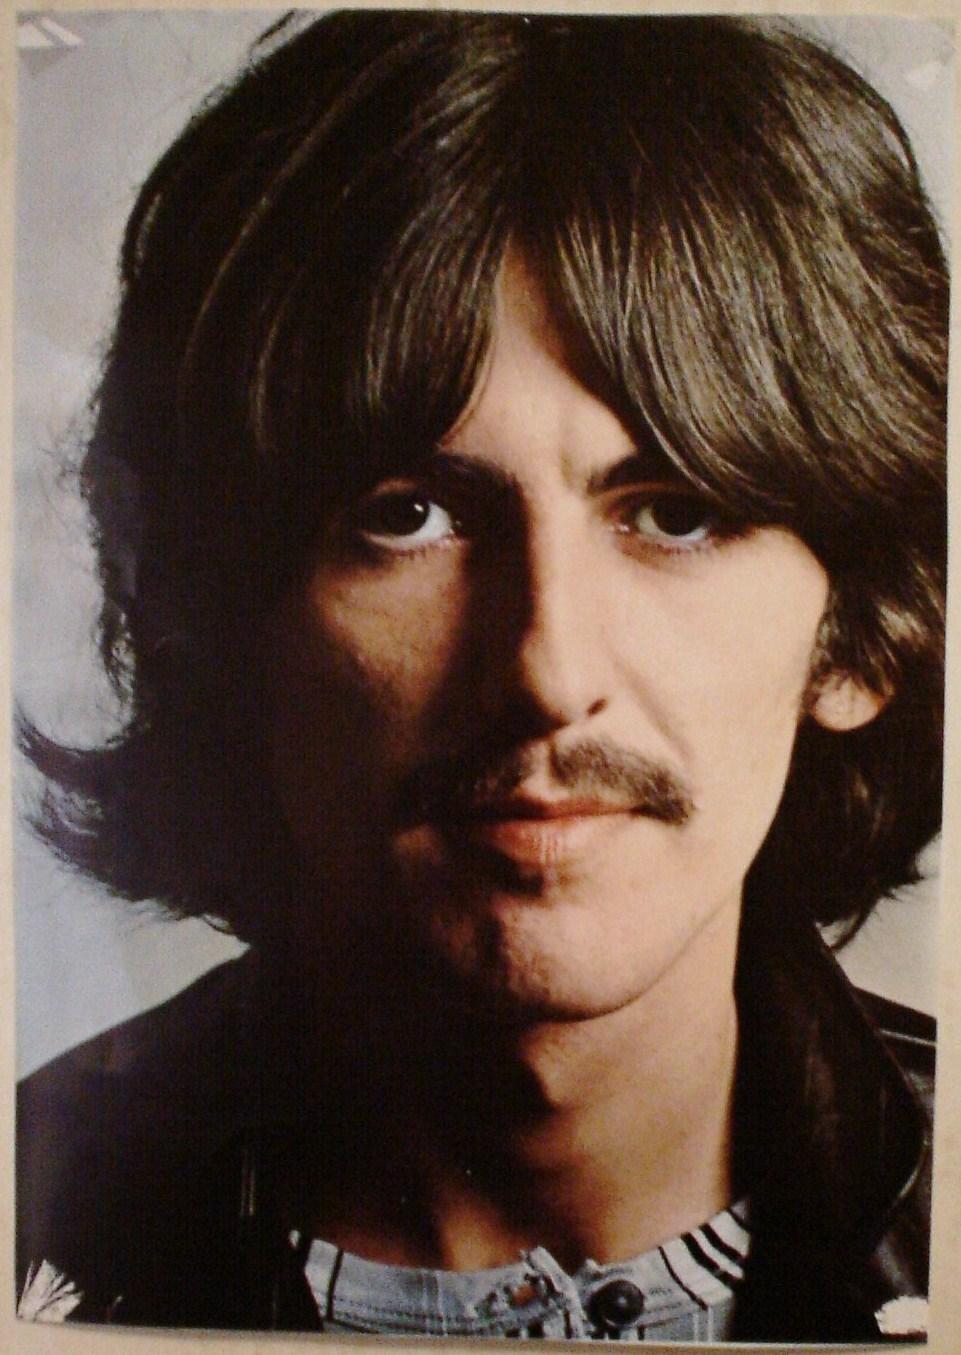 The Beatles the white album - the-white-album-the-beatles-2488768-961-1355